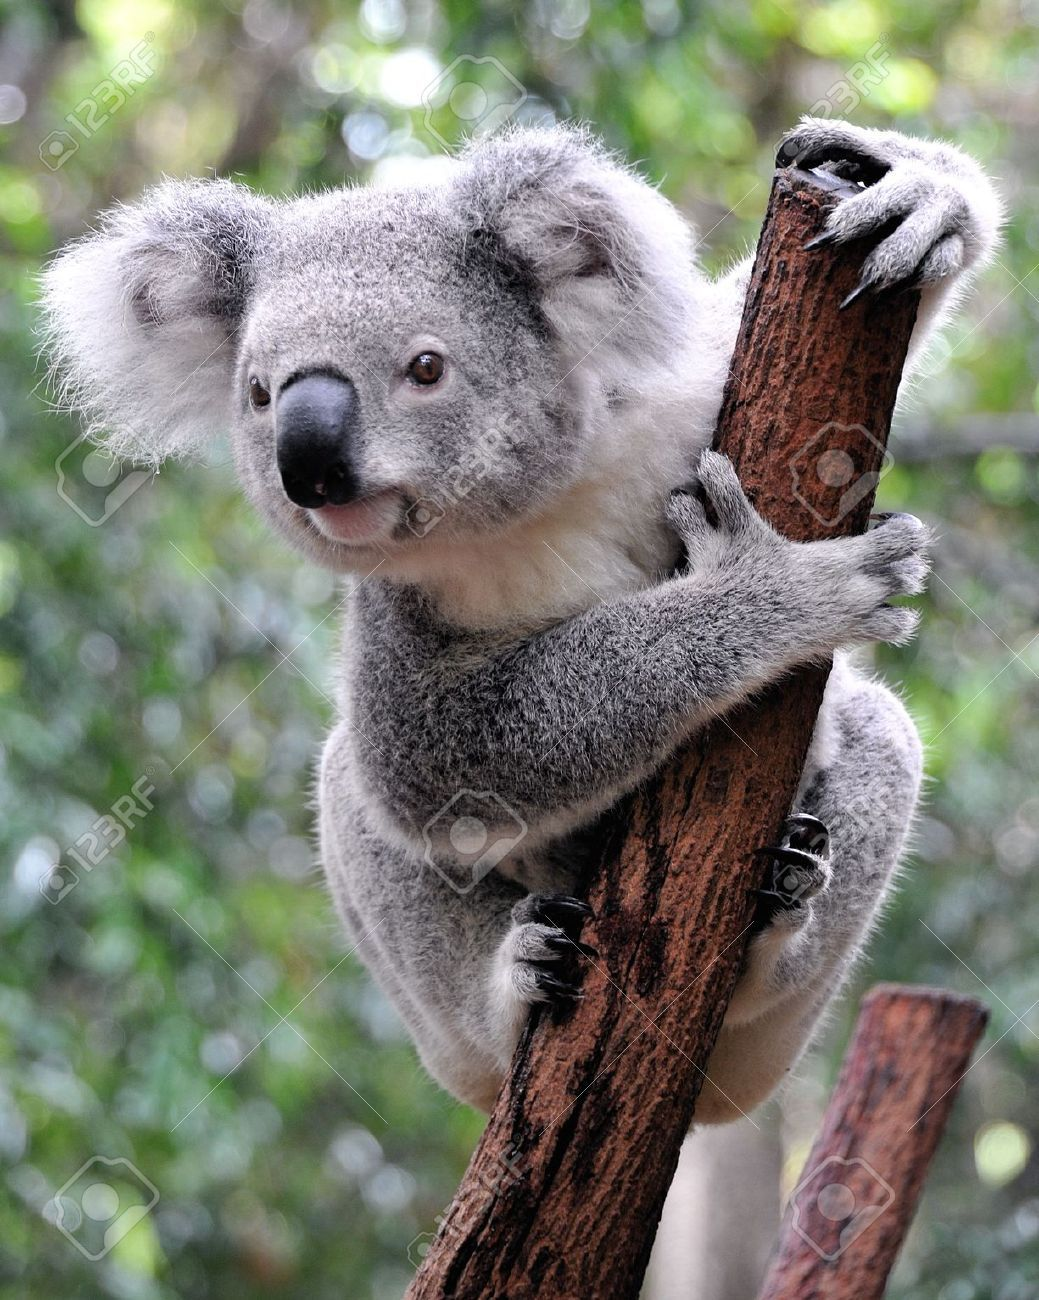 Koala Images Stock Pictures Royalty Free Koala Photos And Stock